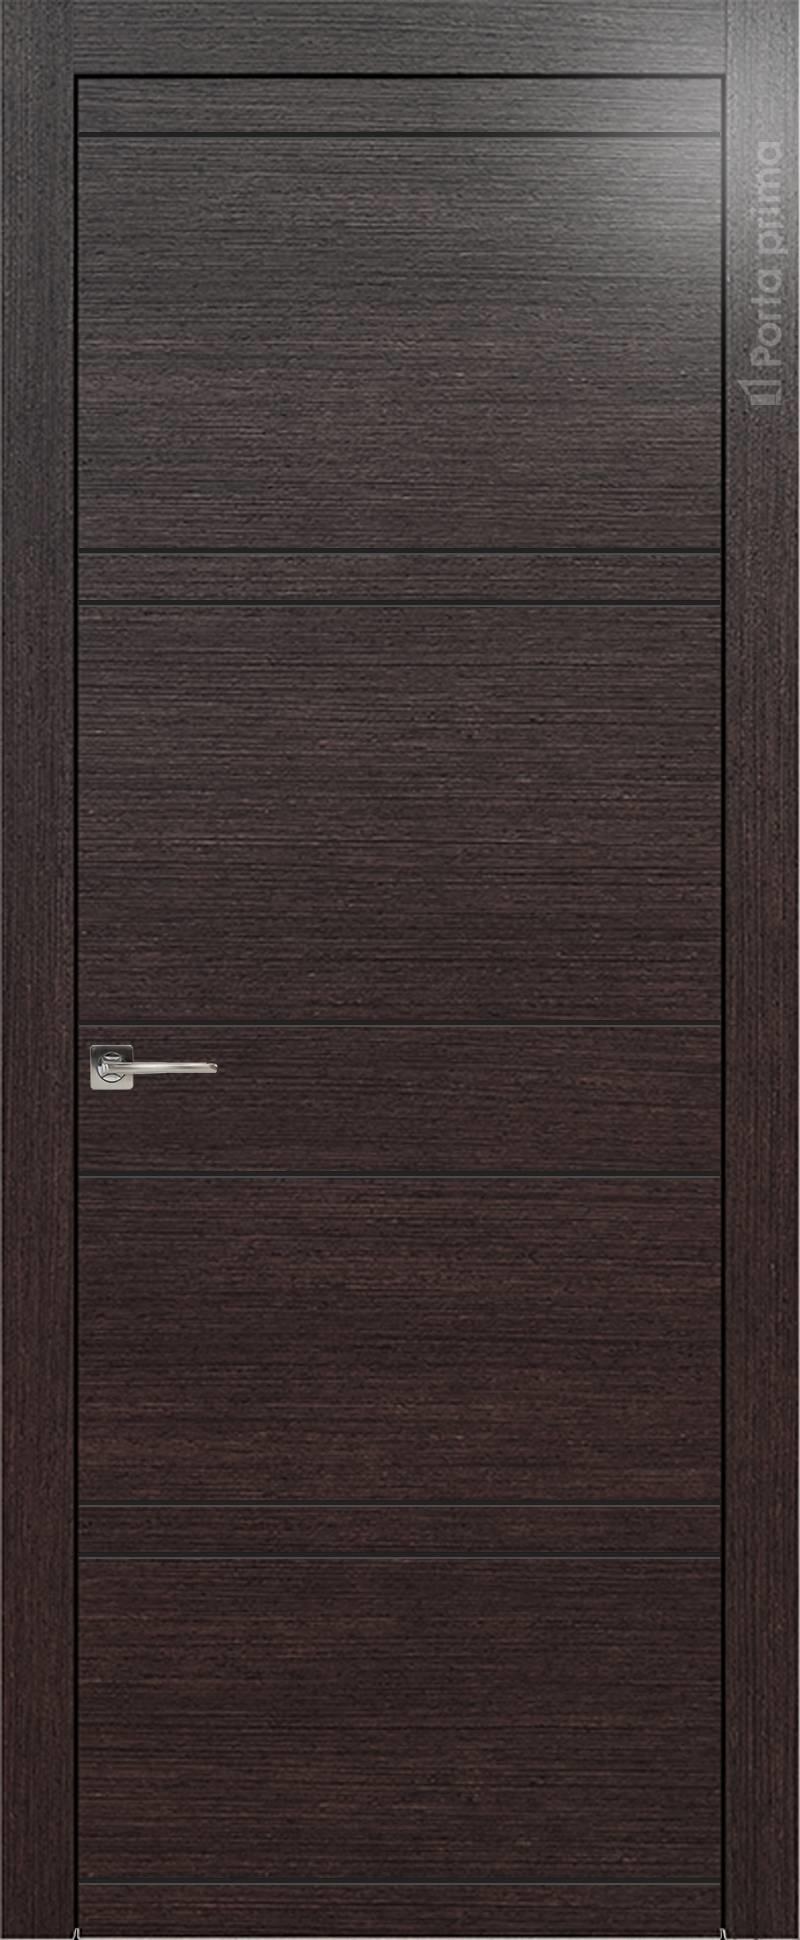 Tivoli Е-2 цвет - Венге Шоколад Без стекла (ДГ)